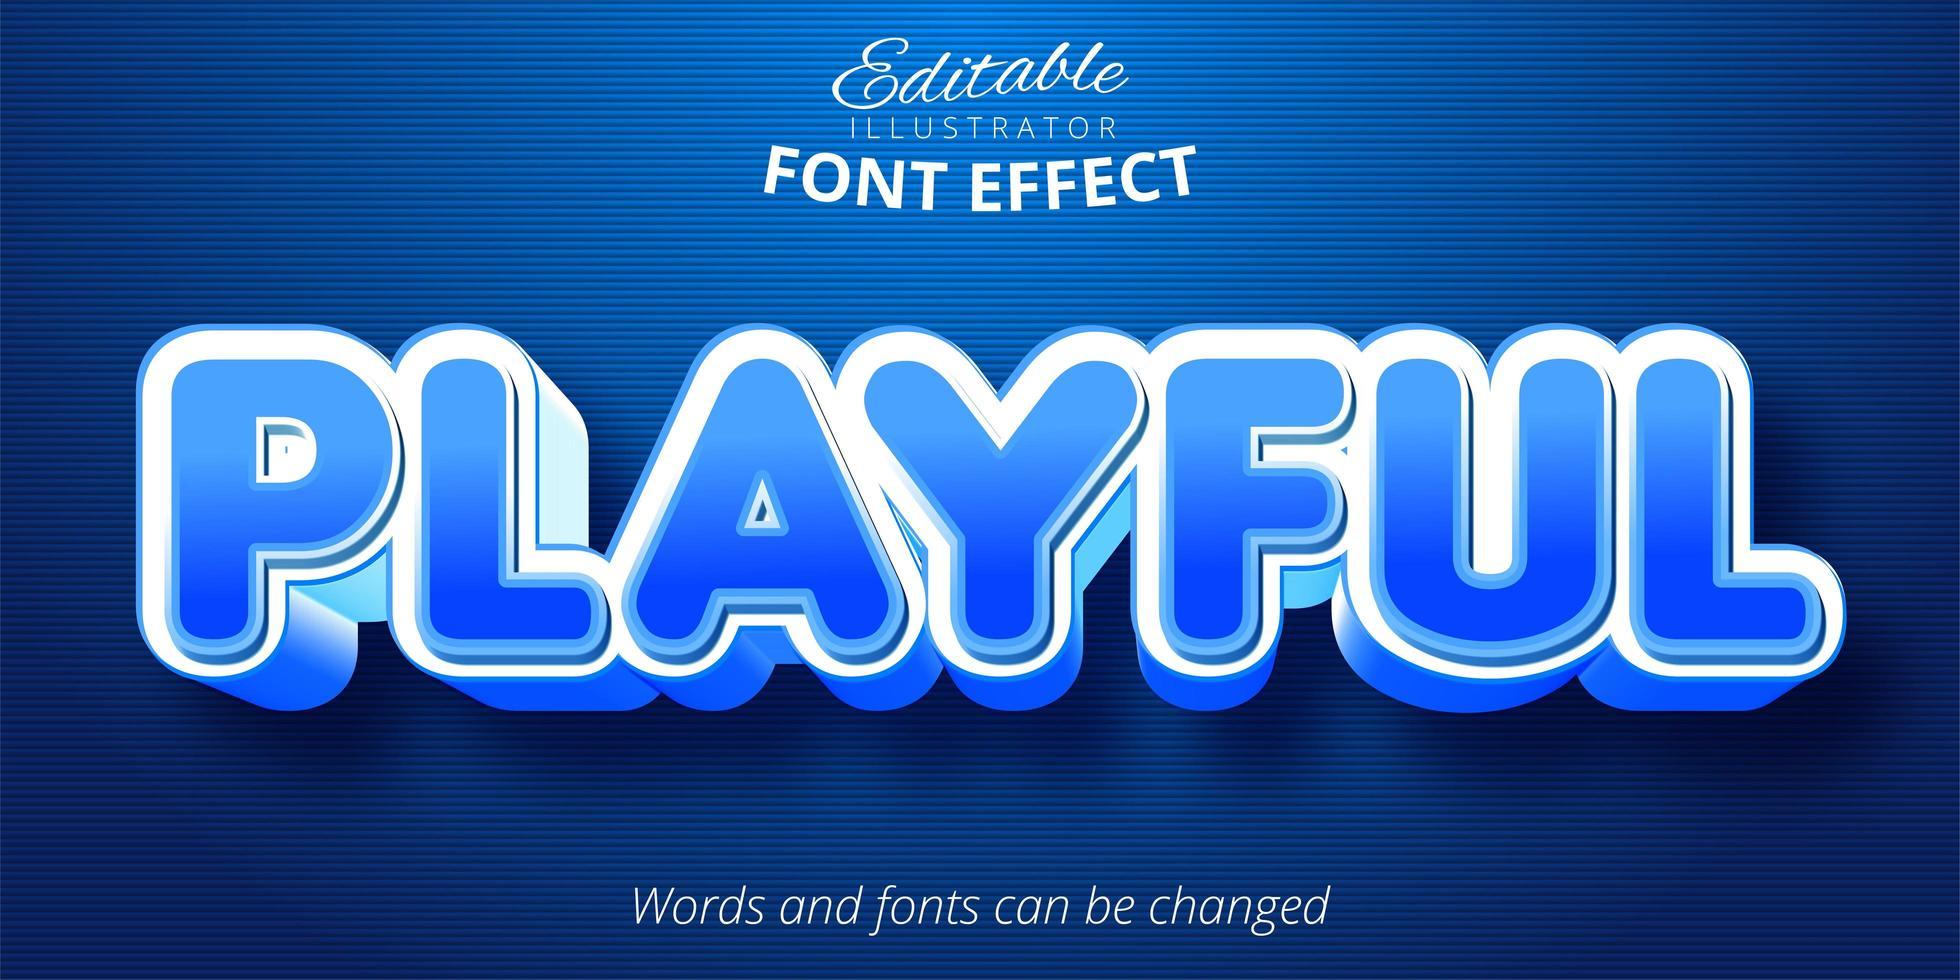 lekfull redigerbar texteffekt vektor